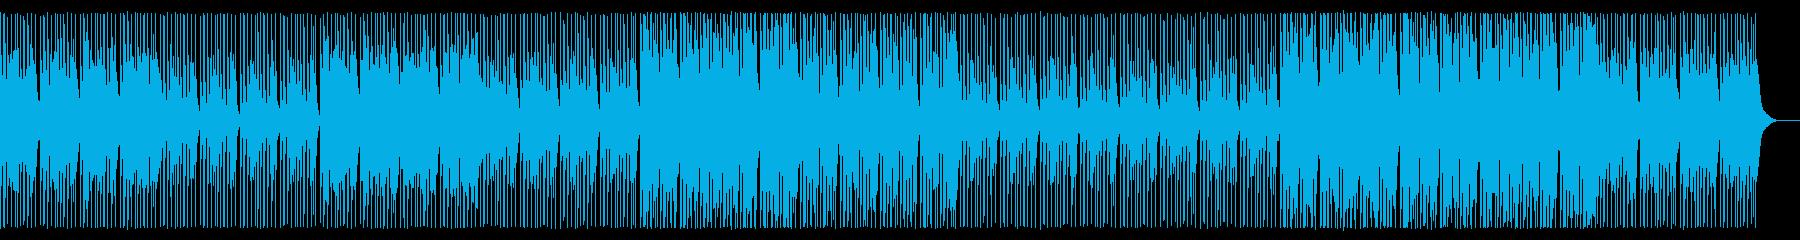 ScienceLaboの再生済みの波形